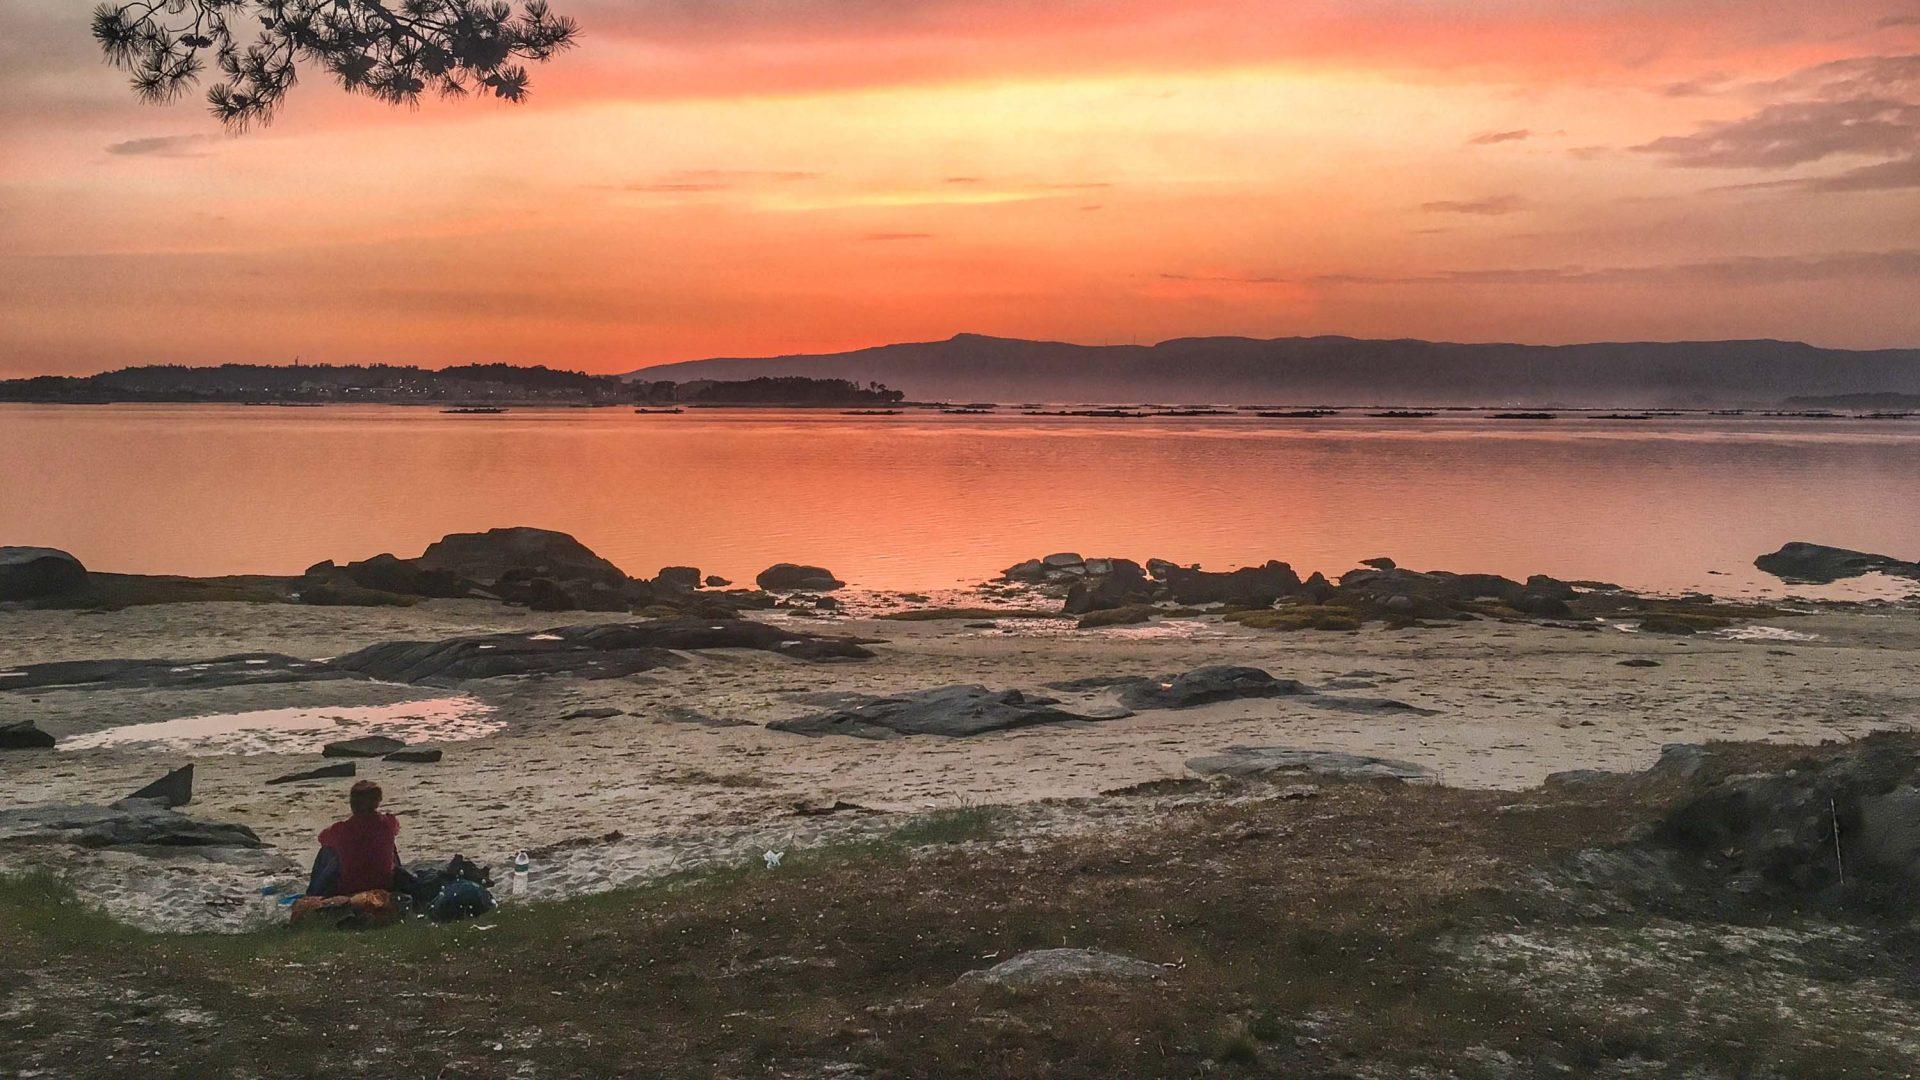 Red skies above a spot where Leon spent the night sleeping on the beach at Vilanova de Arousa, Galicia.